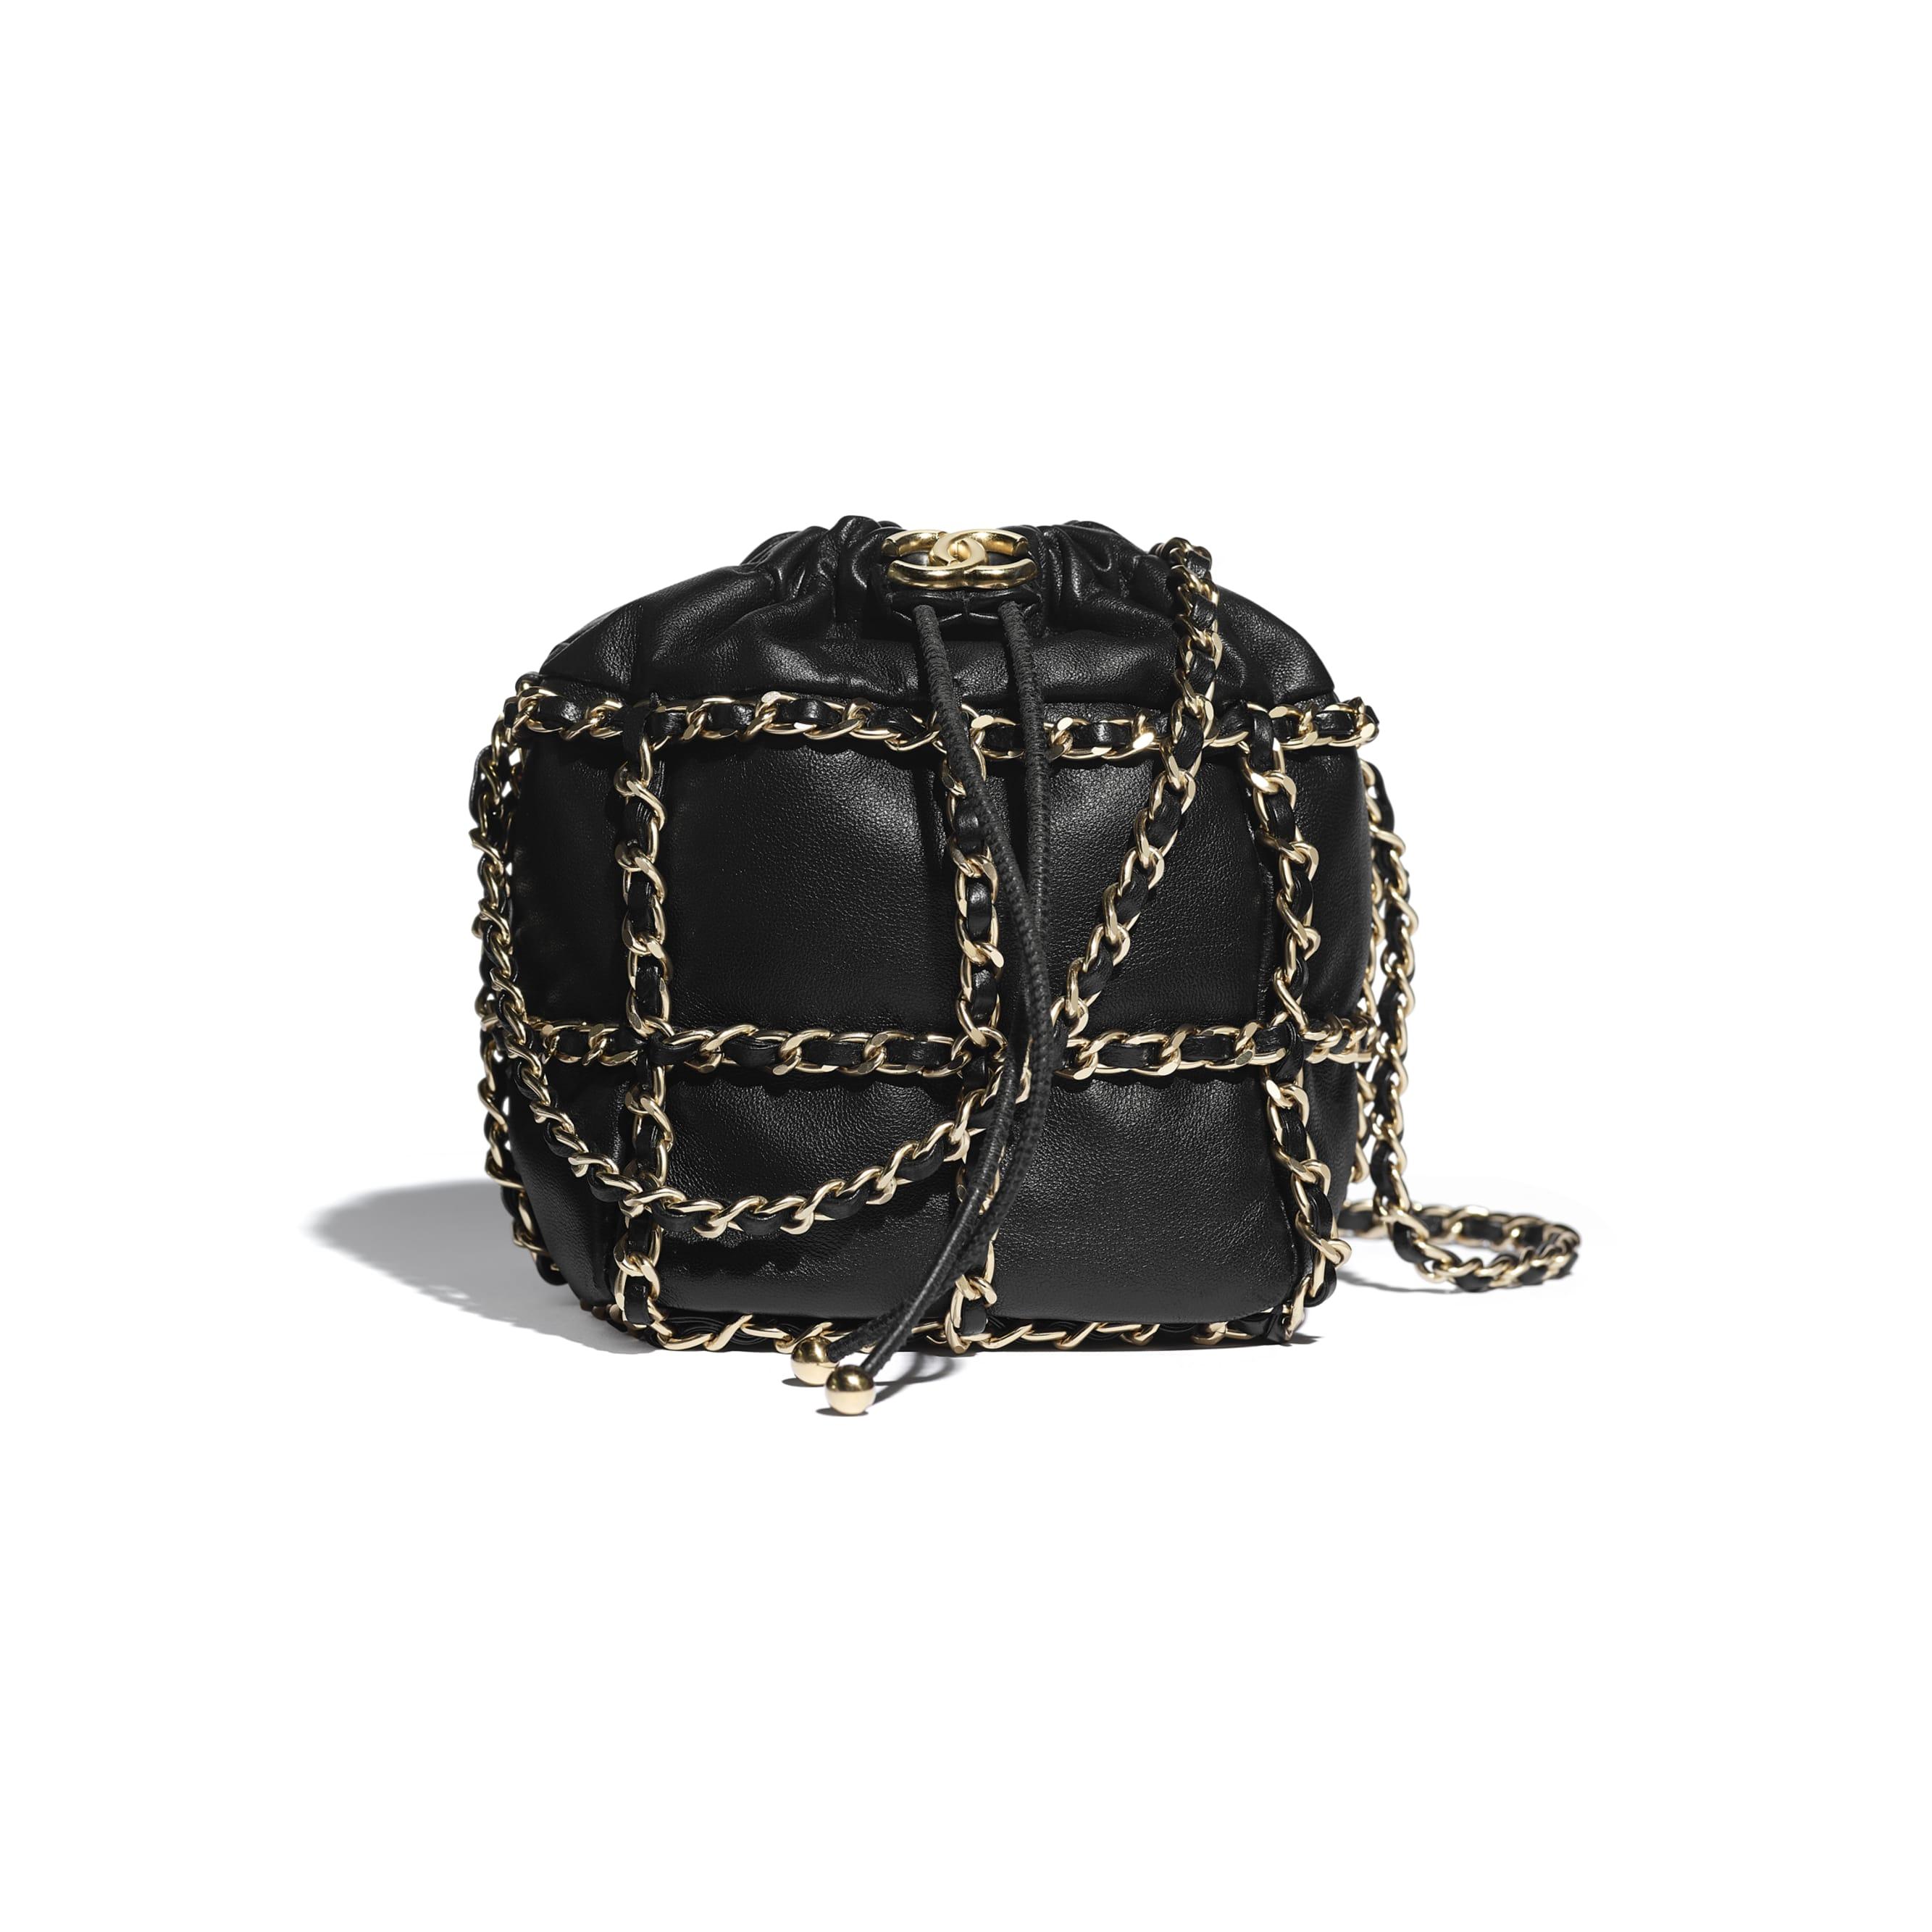 Small Drawstring Bag - Black - Lambskin & Gold Metal  - CHANEL - Default view - see standard sized version